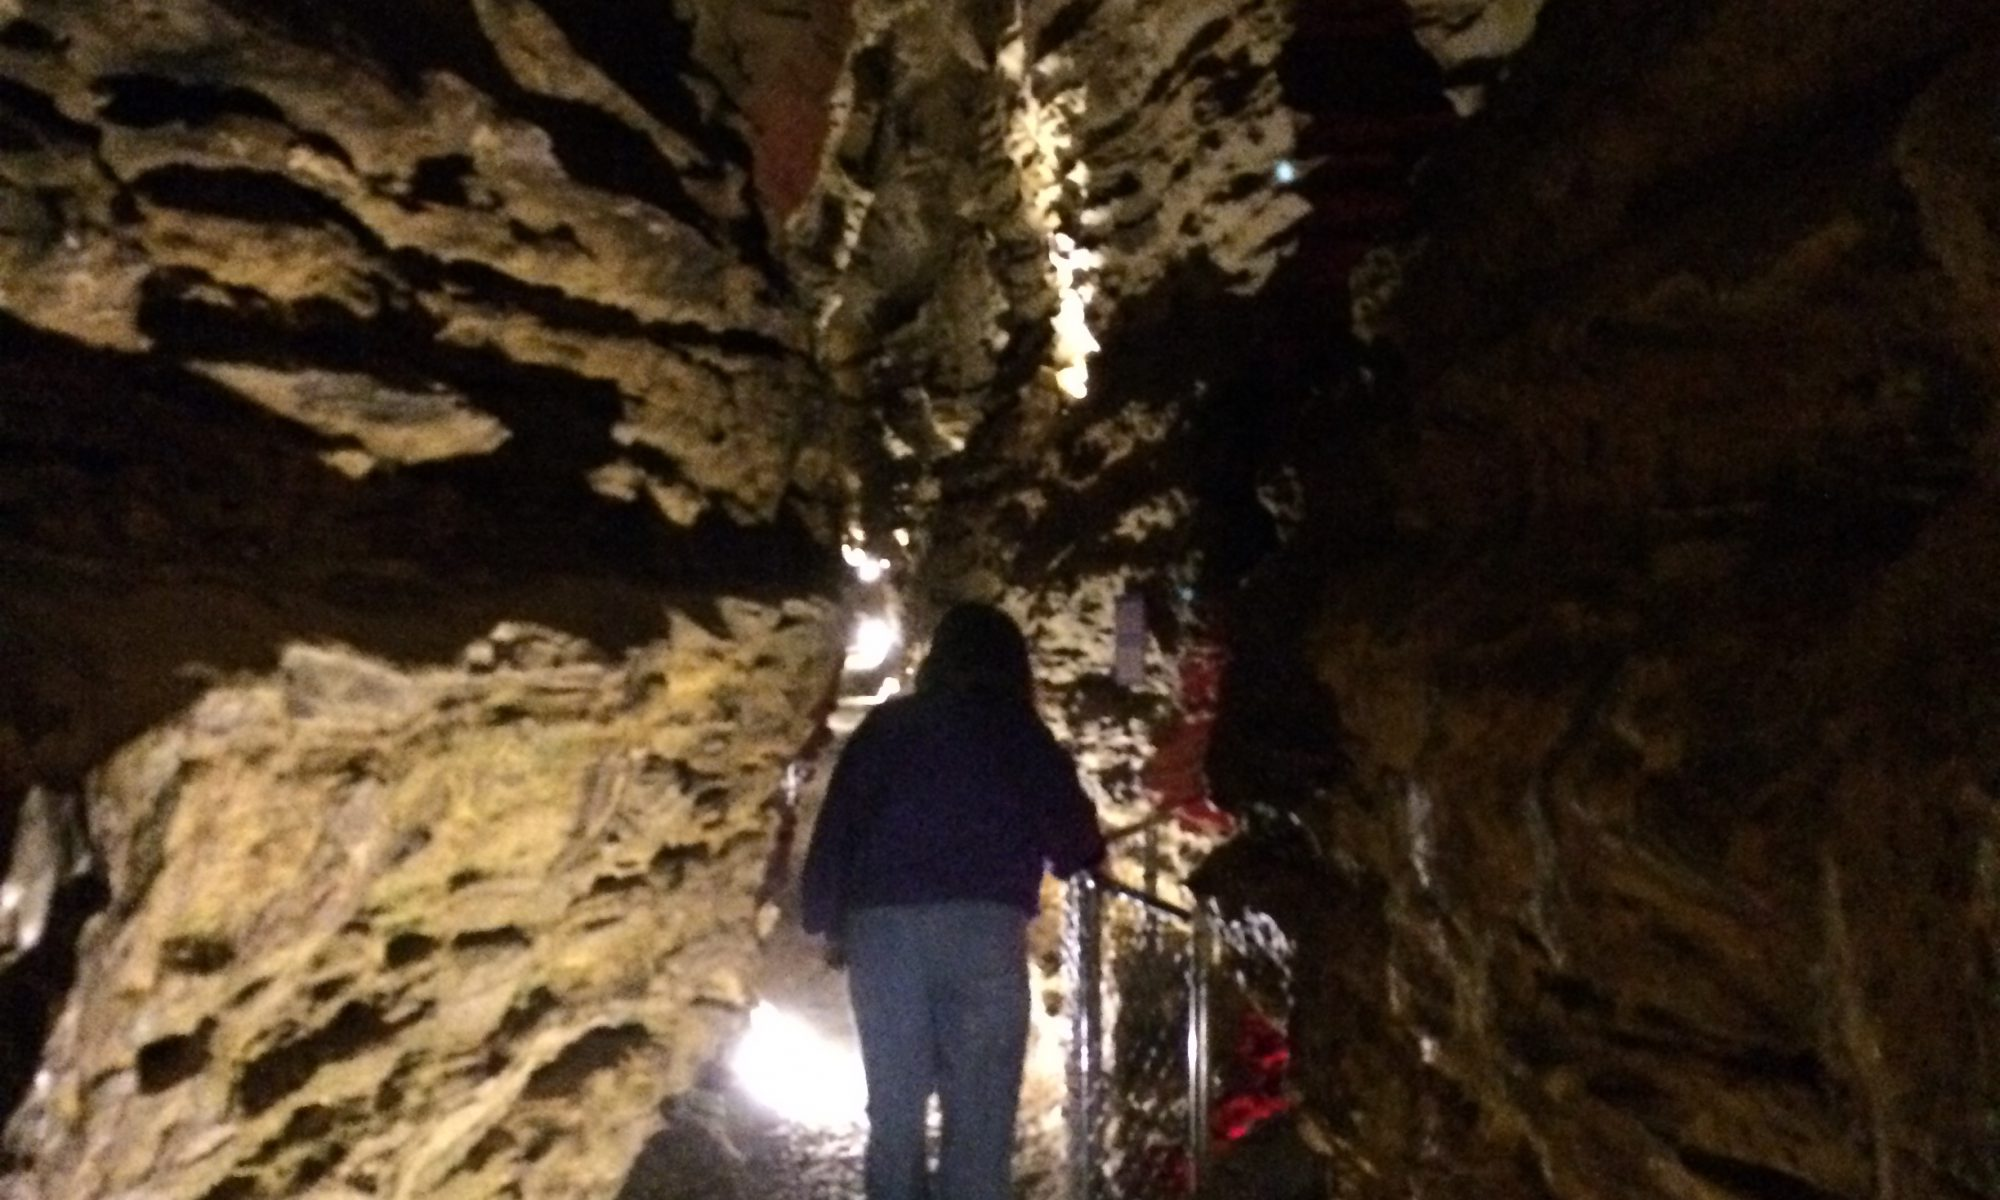 Hannibal Missouri Mark Twain Cave Fenley S Footprints